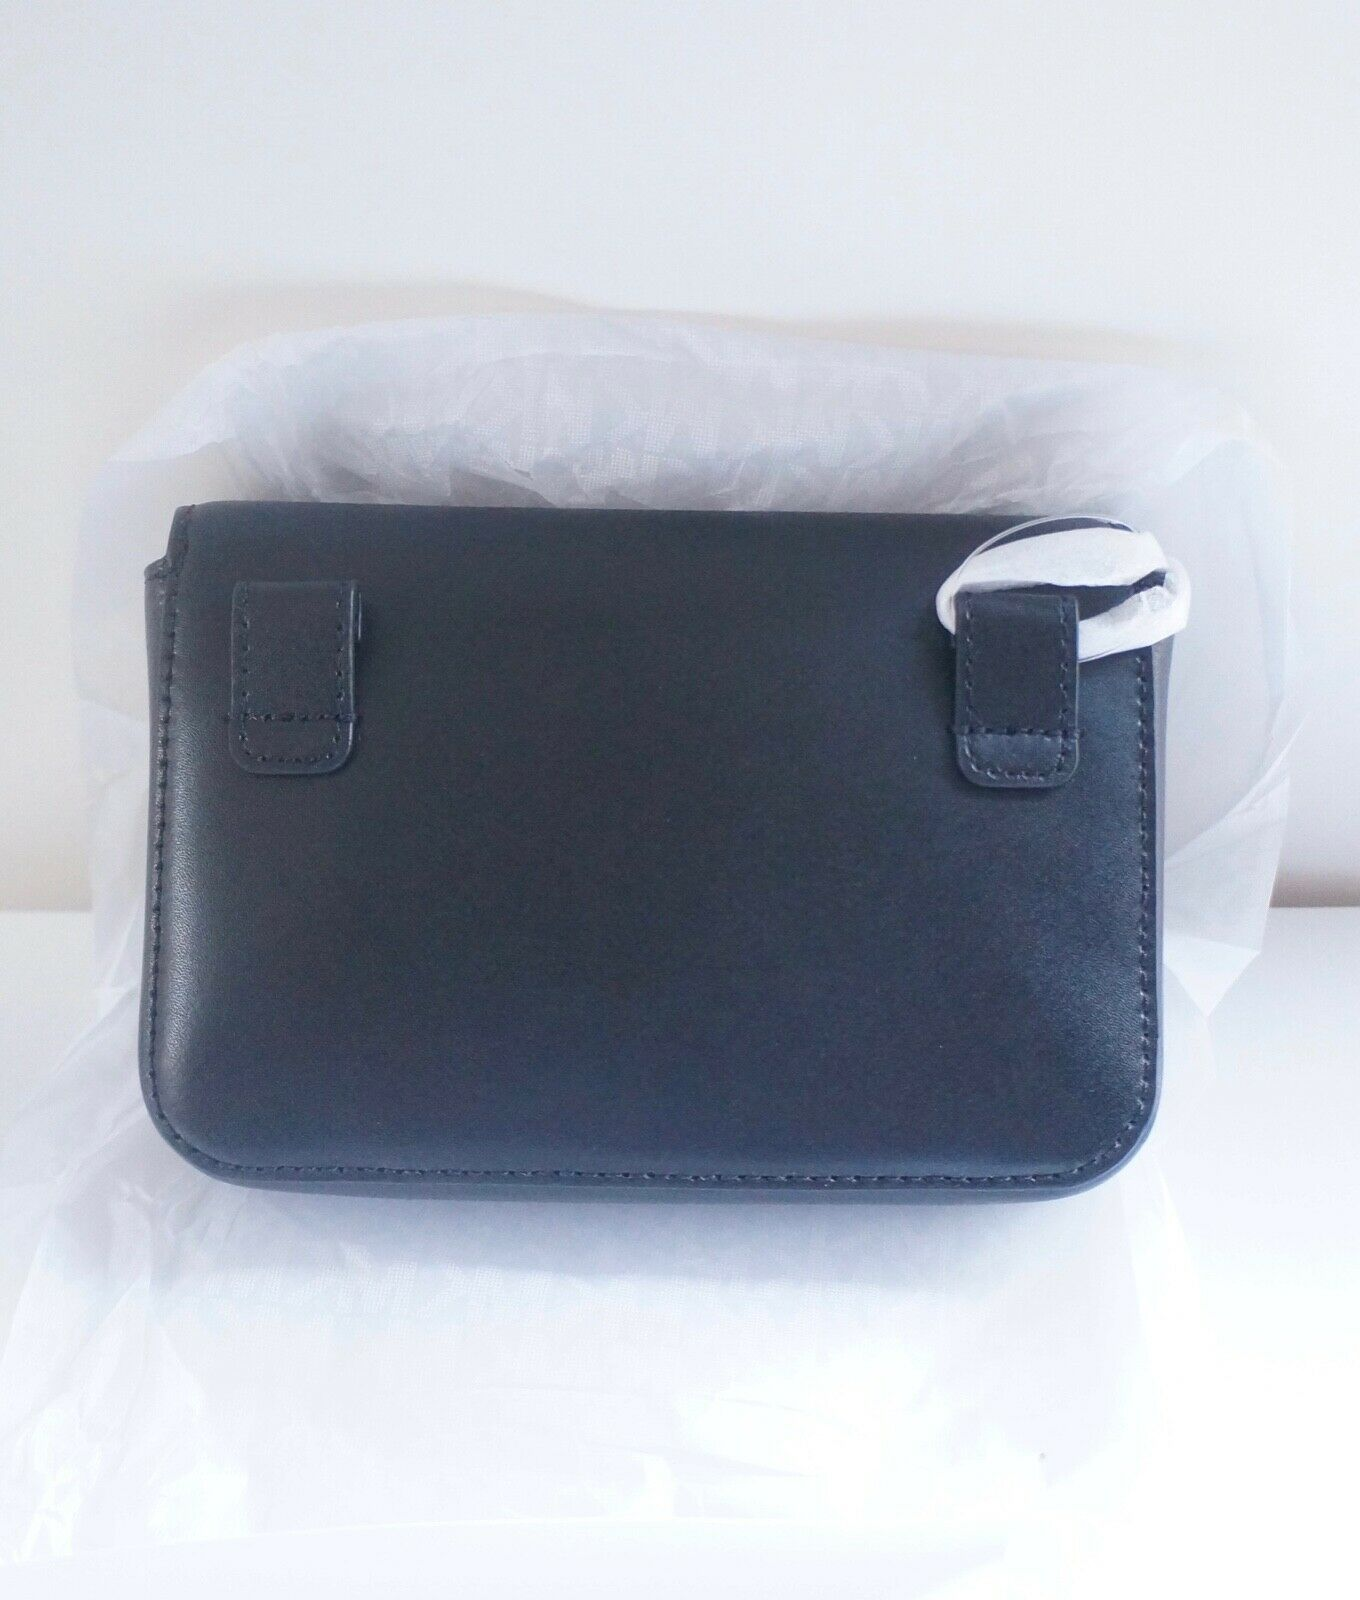 NWT Michael Kors Mott Small Leather Belt Bag/ Black image 3